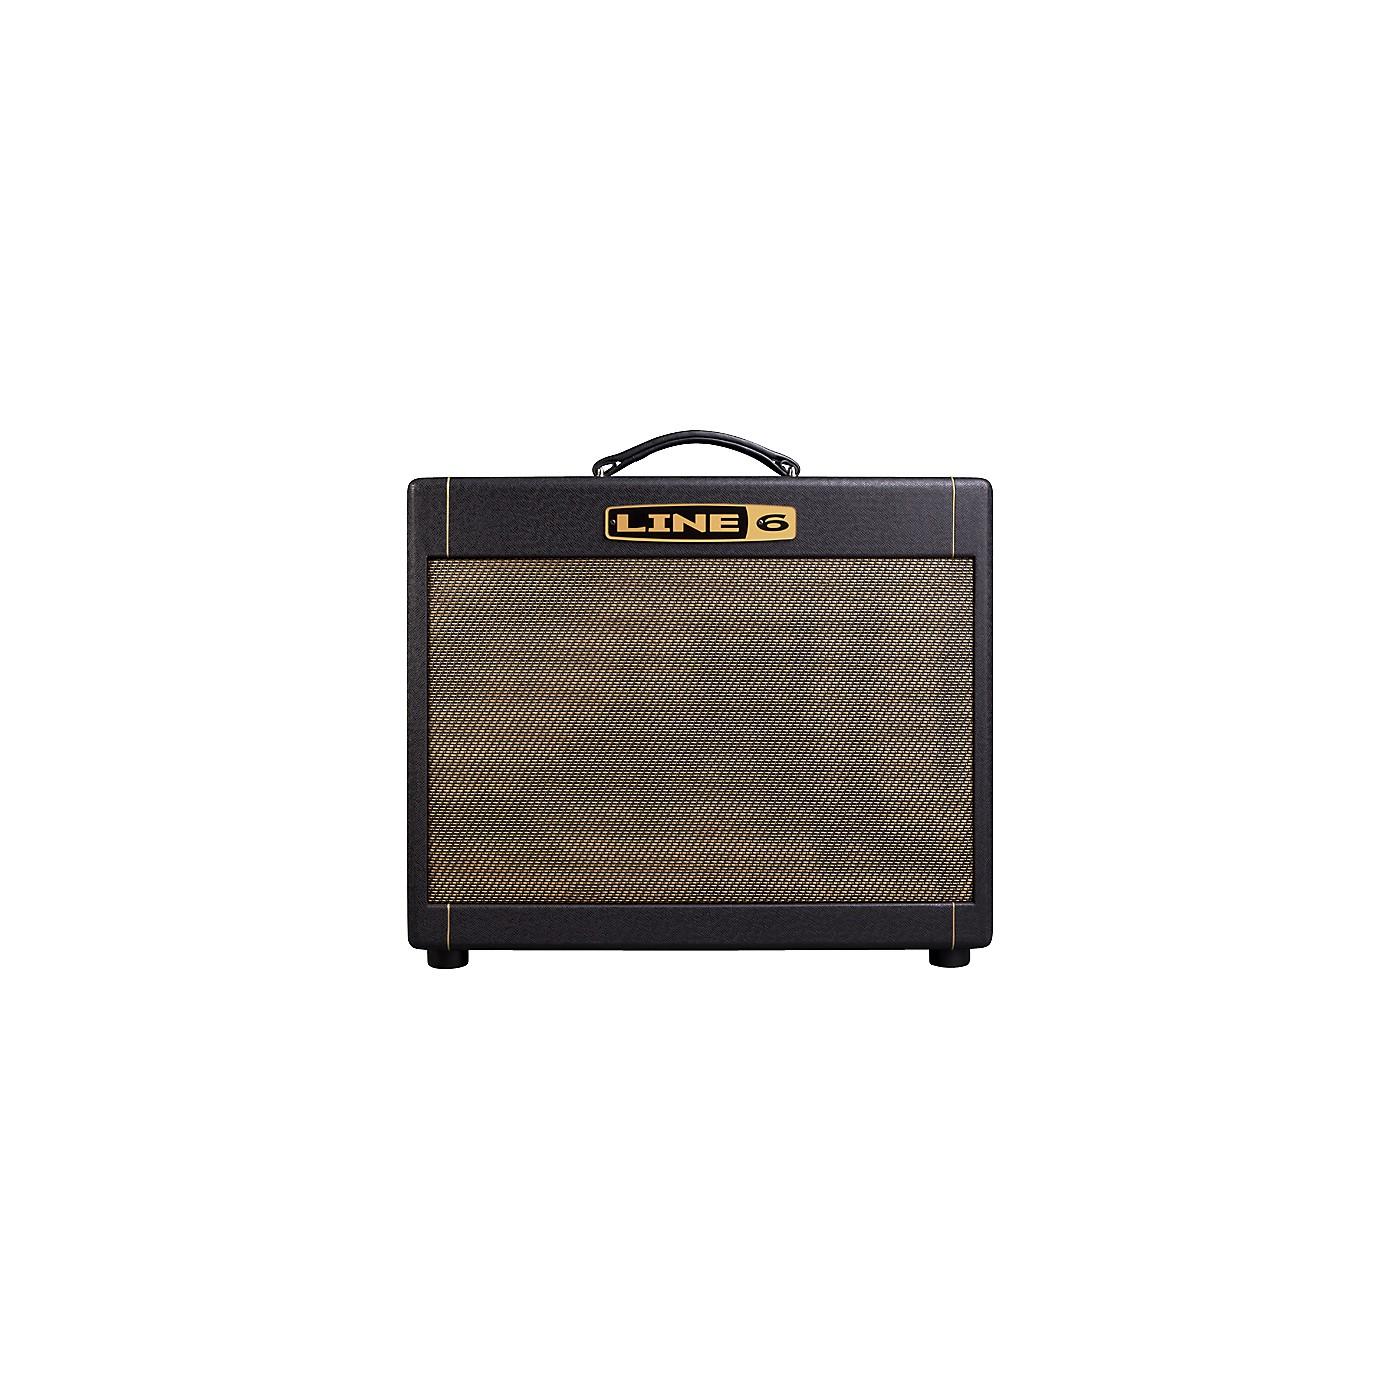 Line 6 DT25 112 1x12 25W Tube Guitar Combo Amp thumbnail